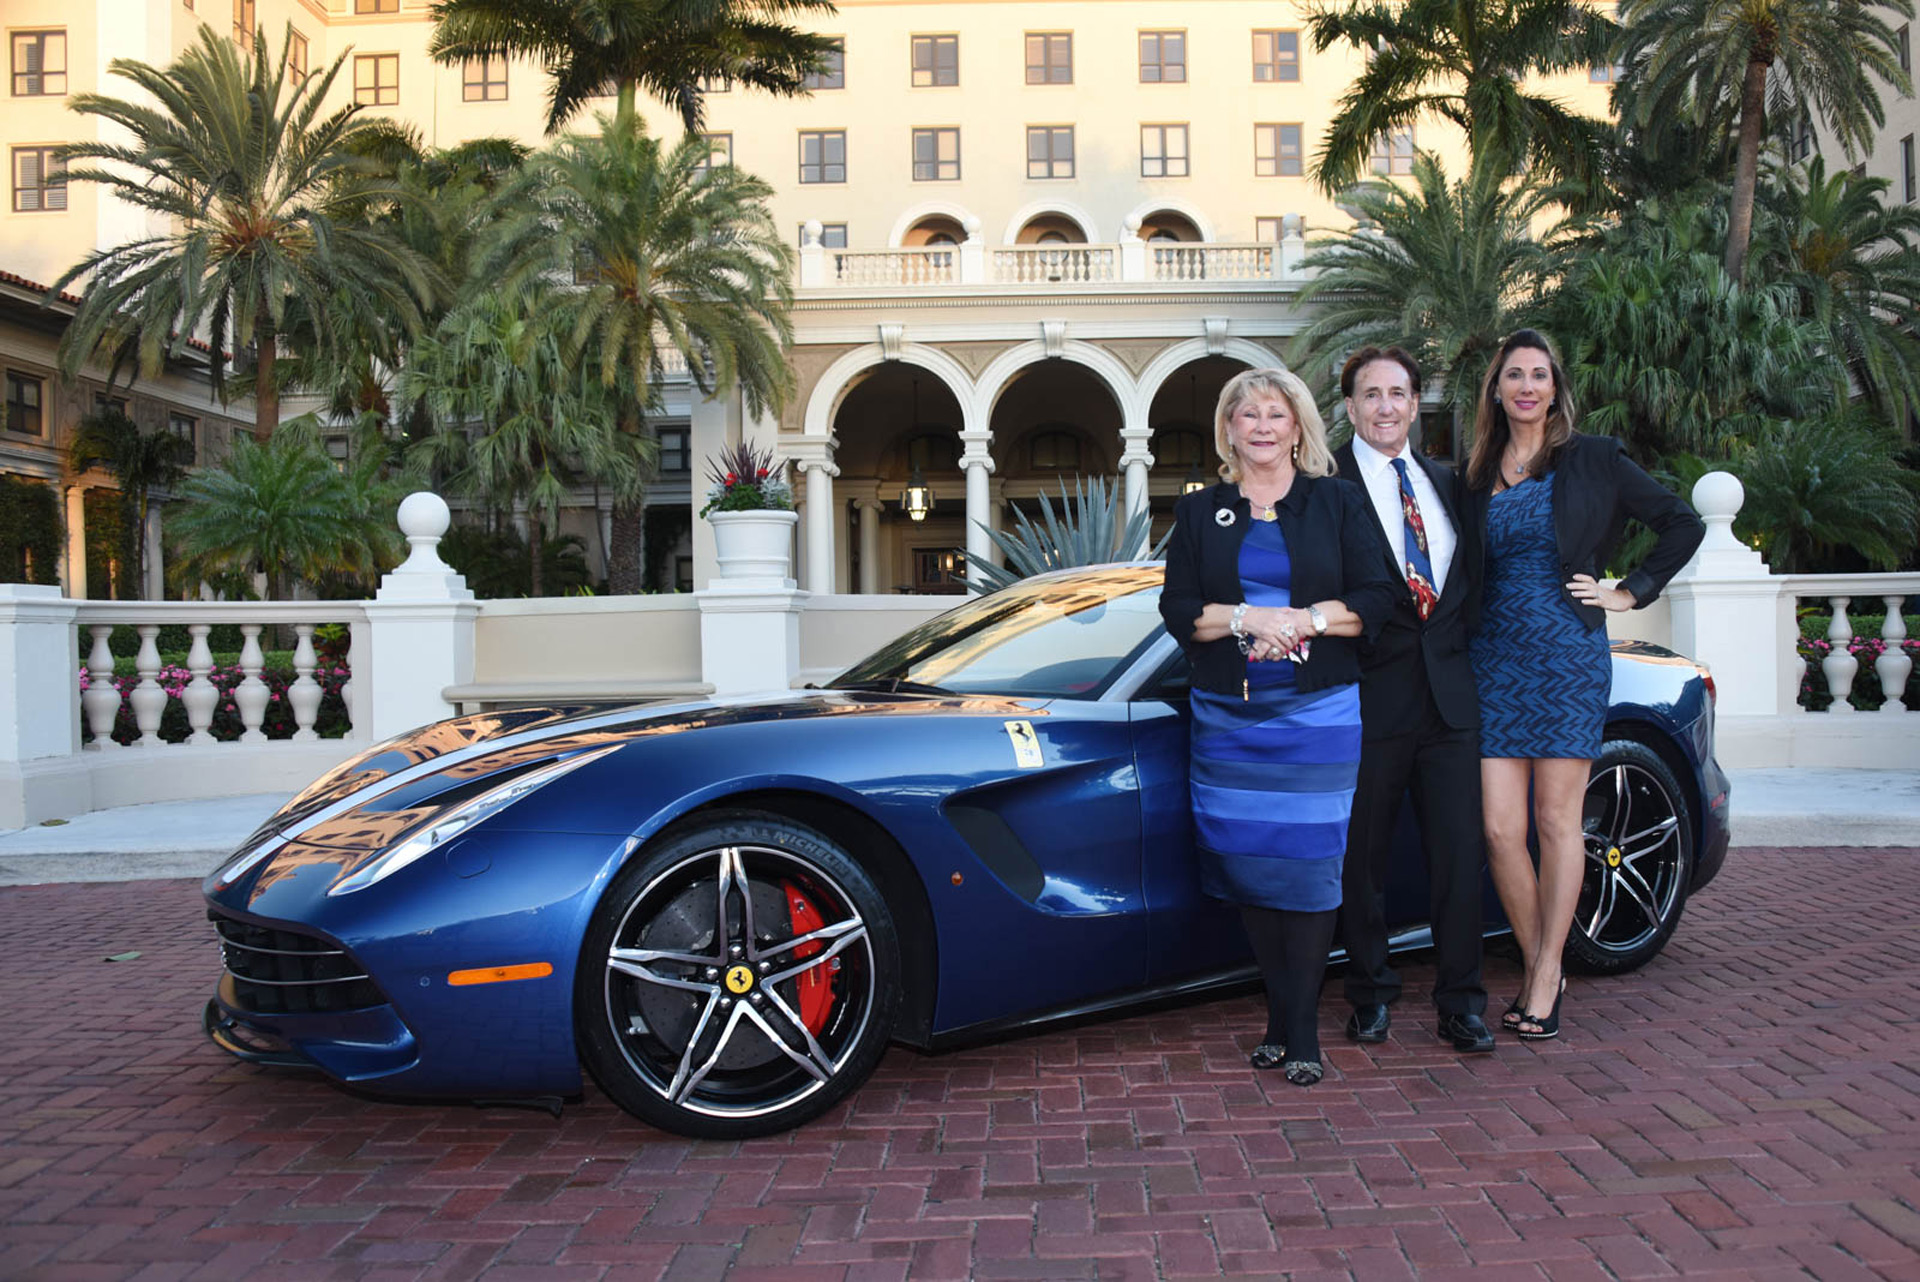 Of 10 Ferrari F60 Americas Delivered To Customer